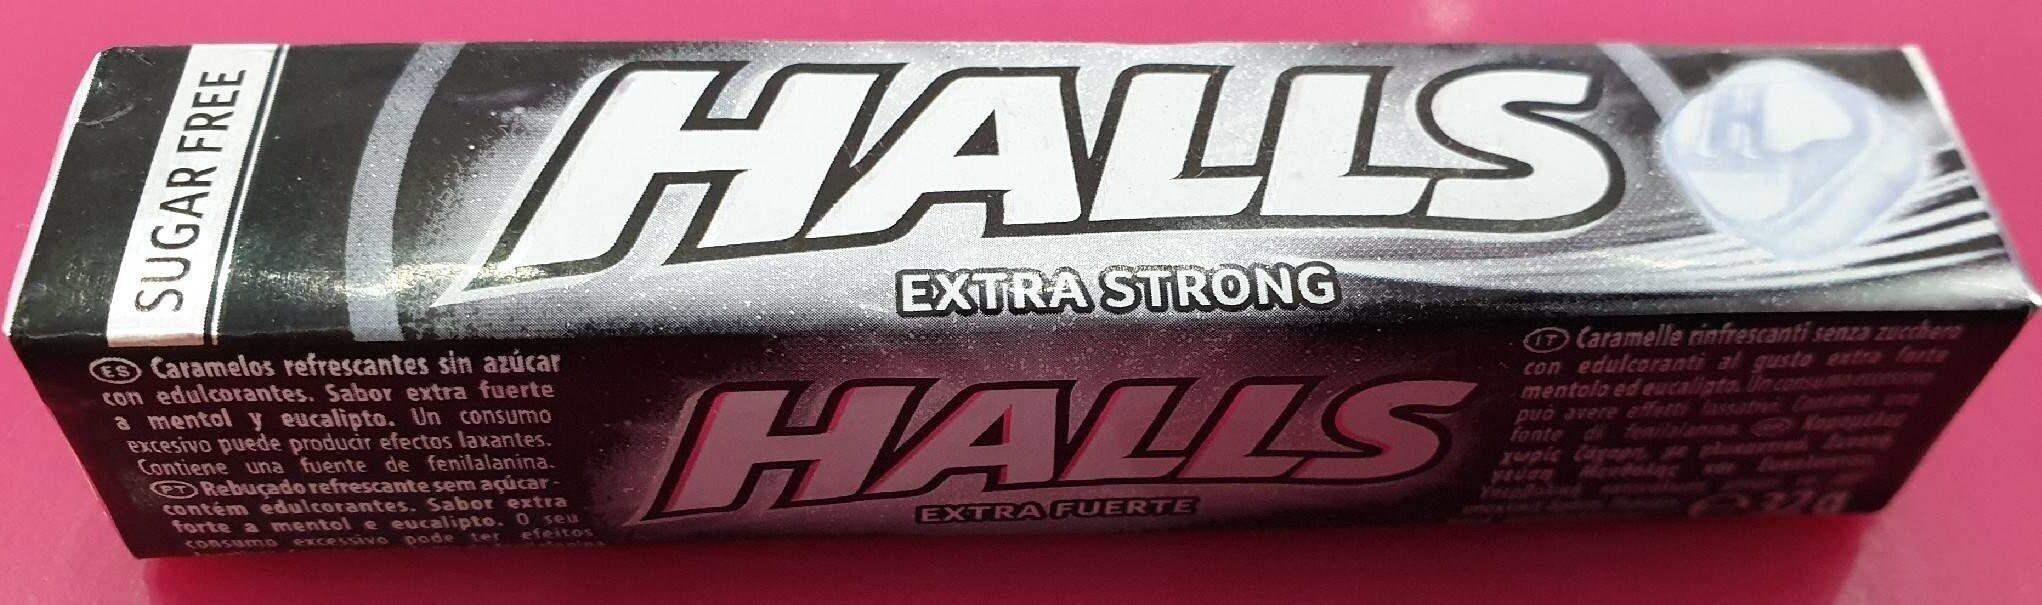 HALLS extra strong - Produit - es